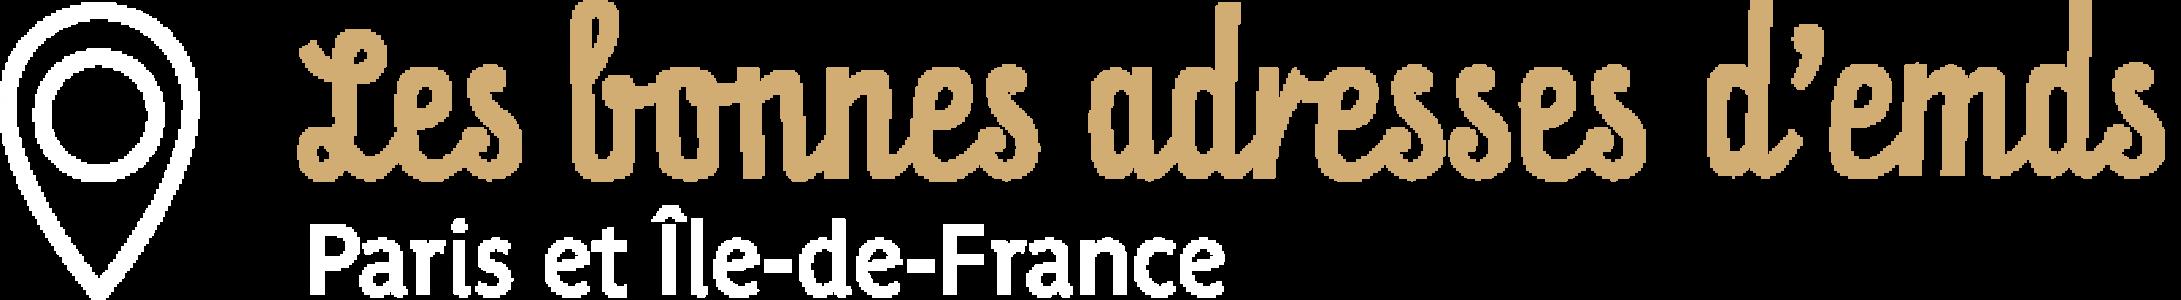 Les bonnes adresses de Paris – IDF